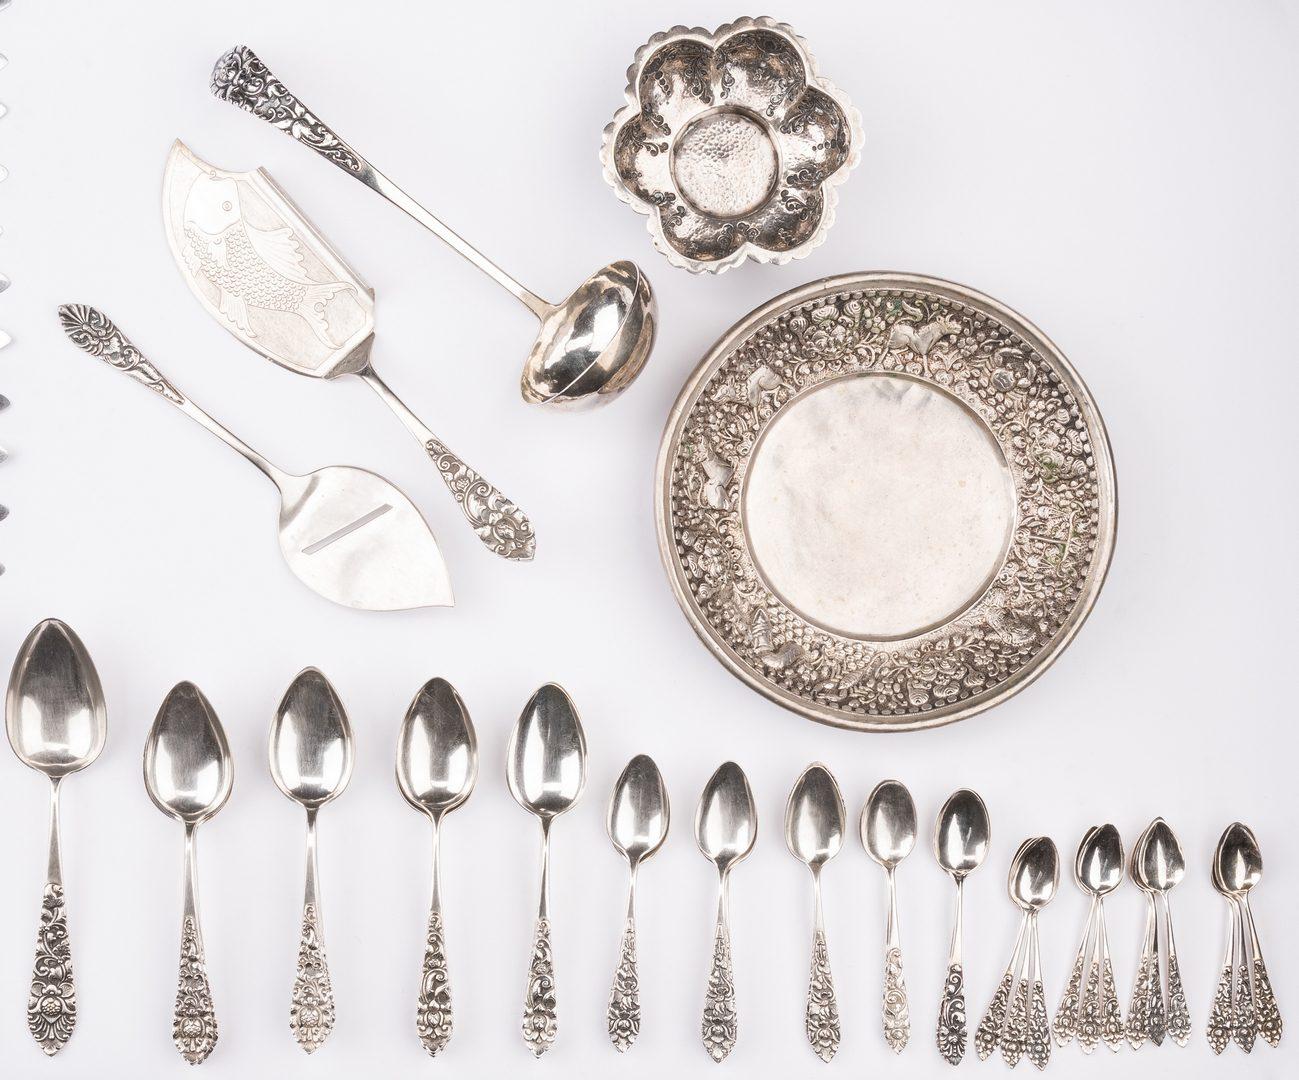 Lot 40: 100 ps Indonesian Silver Flatware plus 2 bowls, 102 pcs